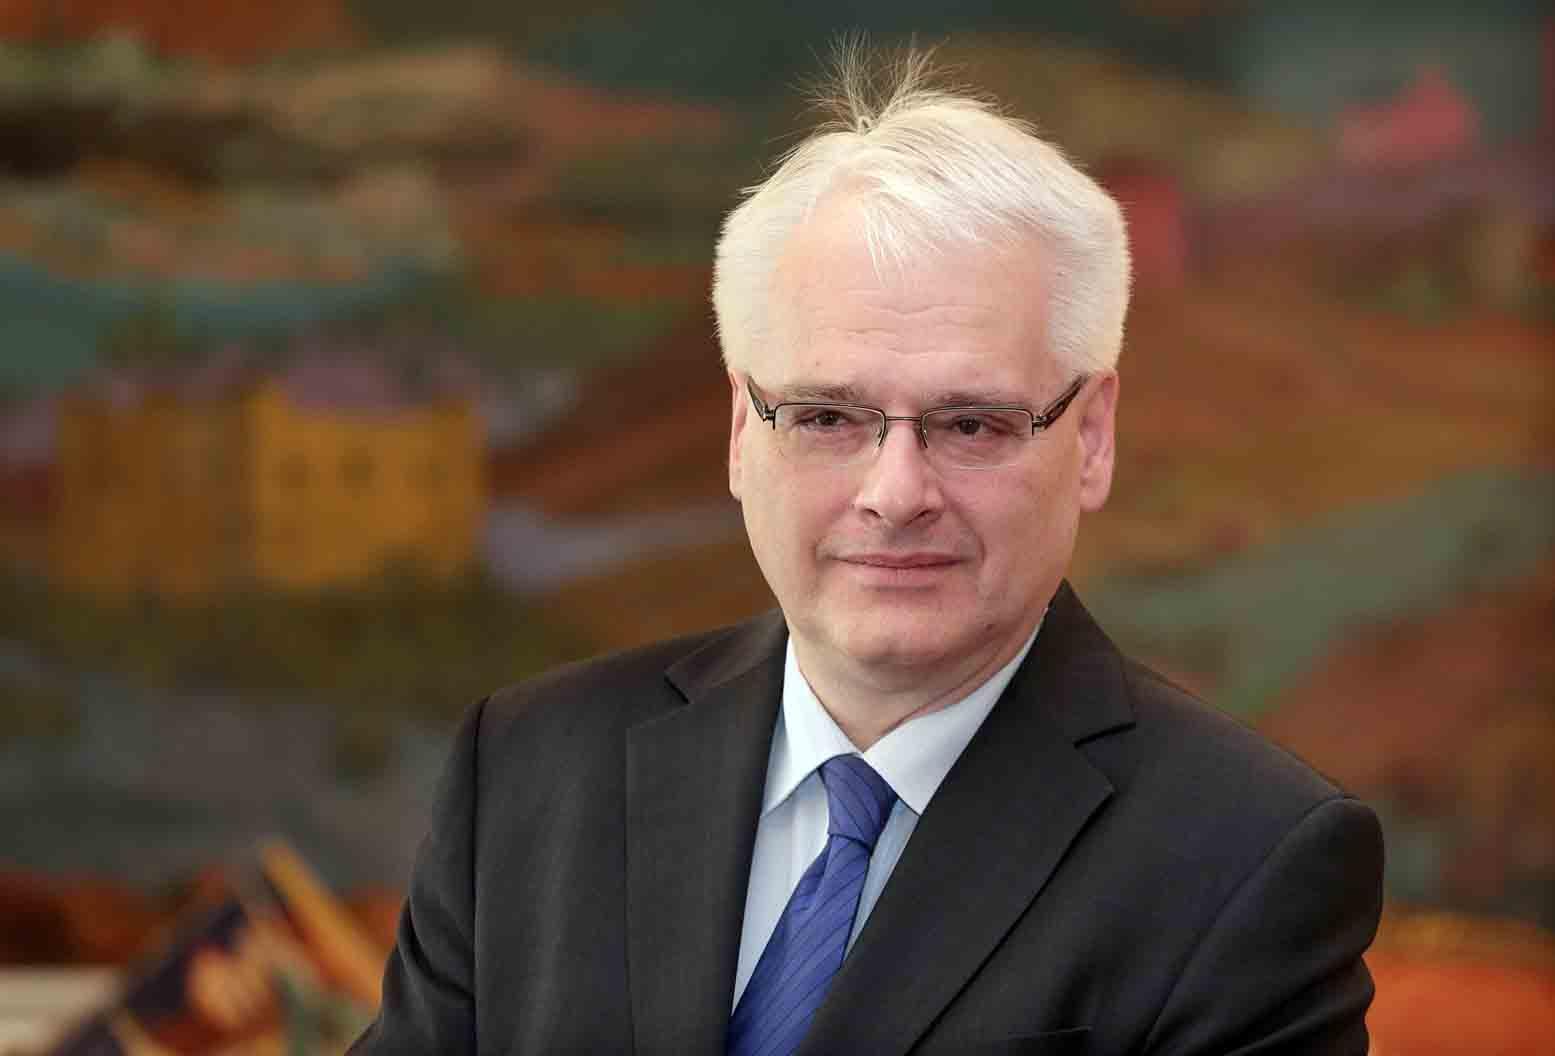 Ivo Josipović by Žarko Bašić PIXSELL